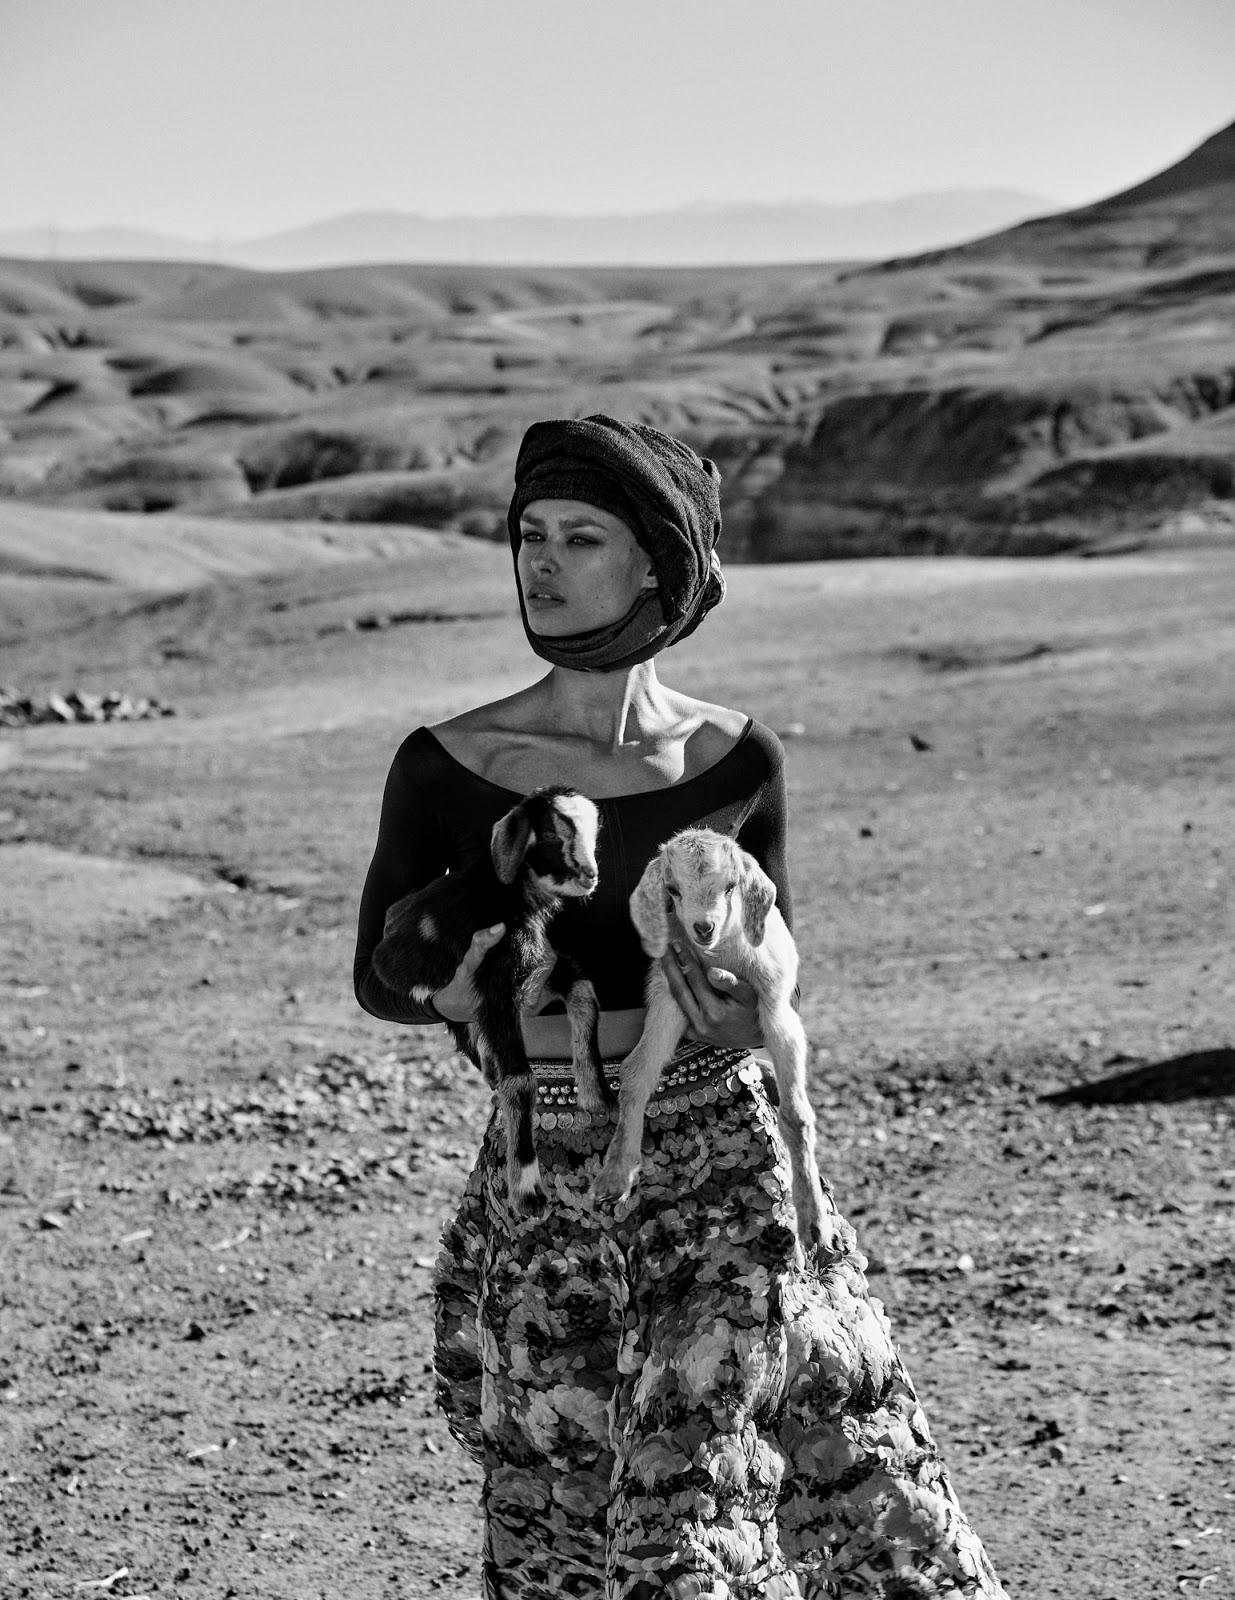 Birgit-Kos-Vogue-Germany-April-2019-11.jpg